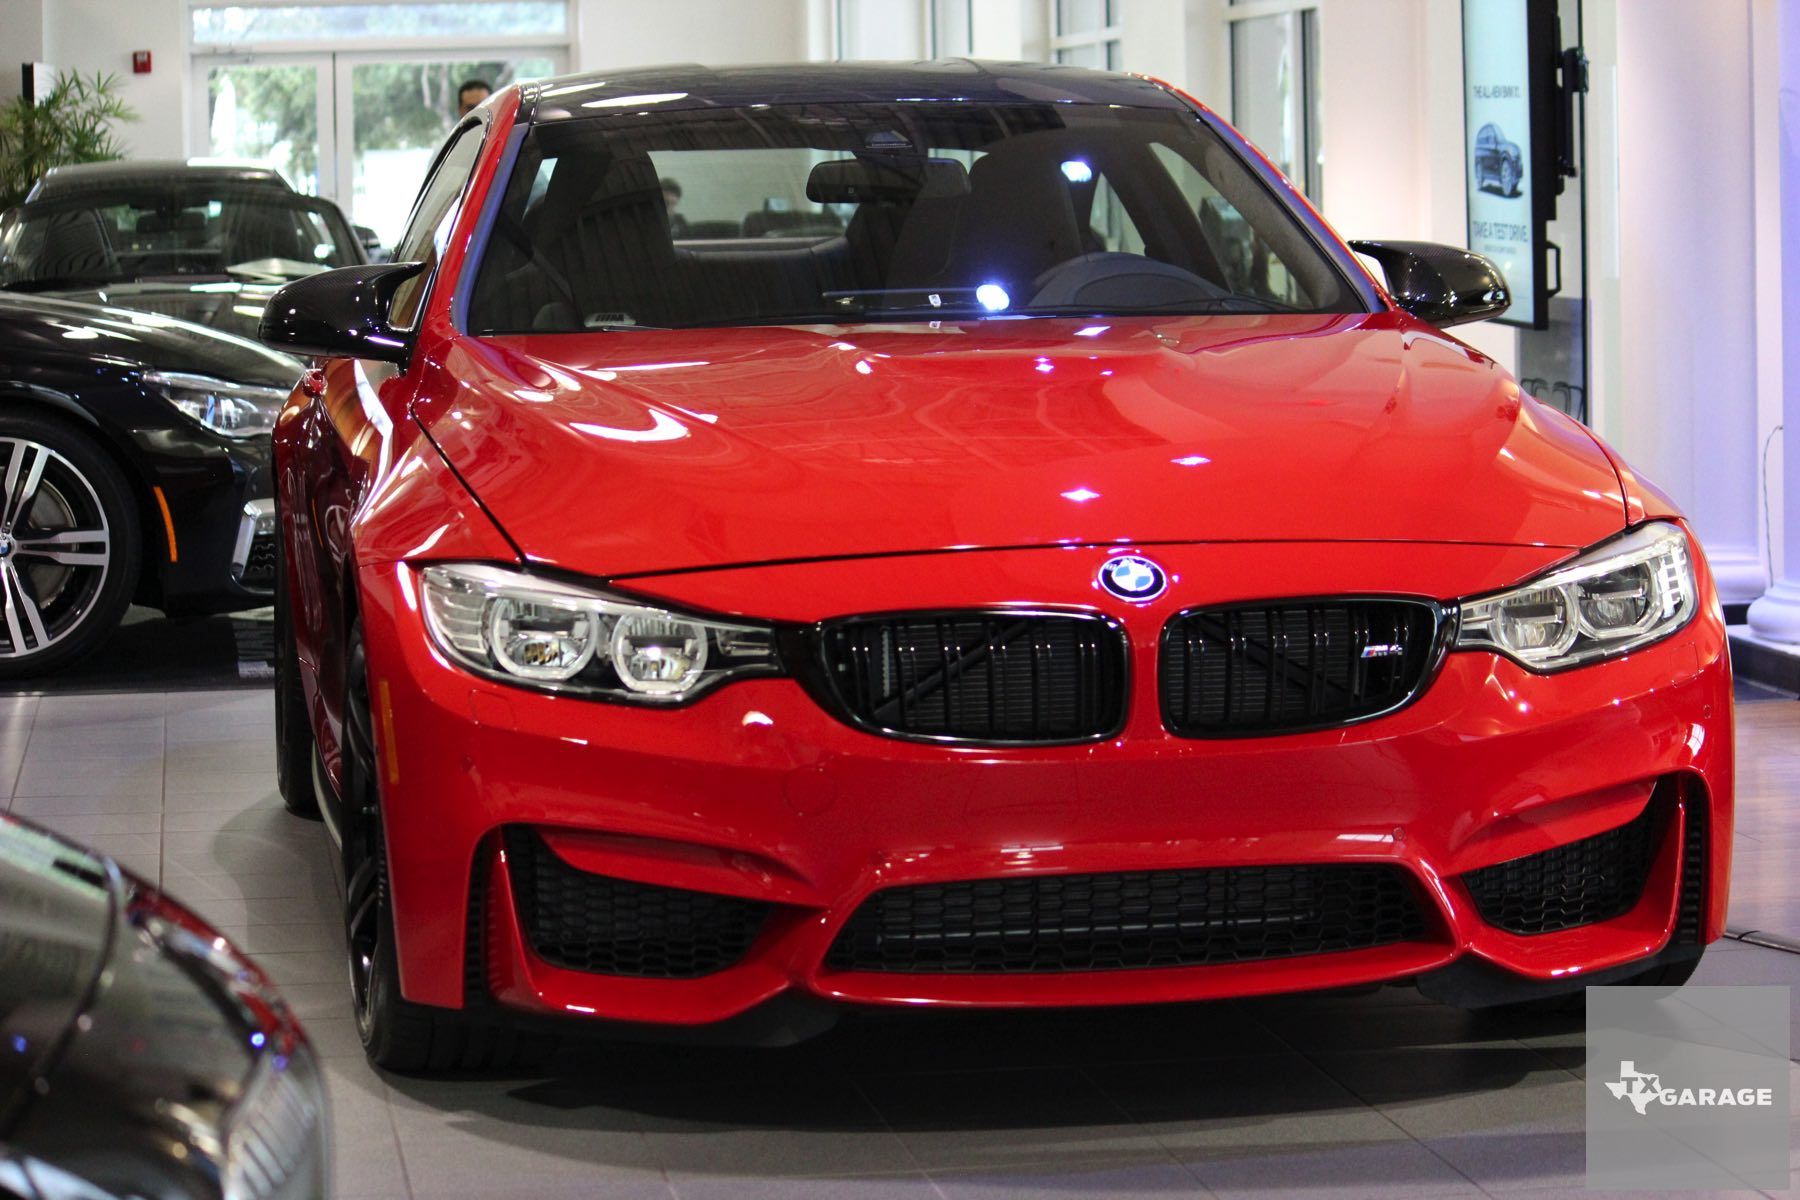 Bmw M4 2016 Red